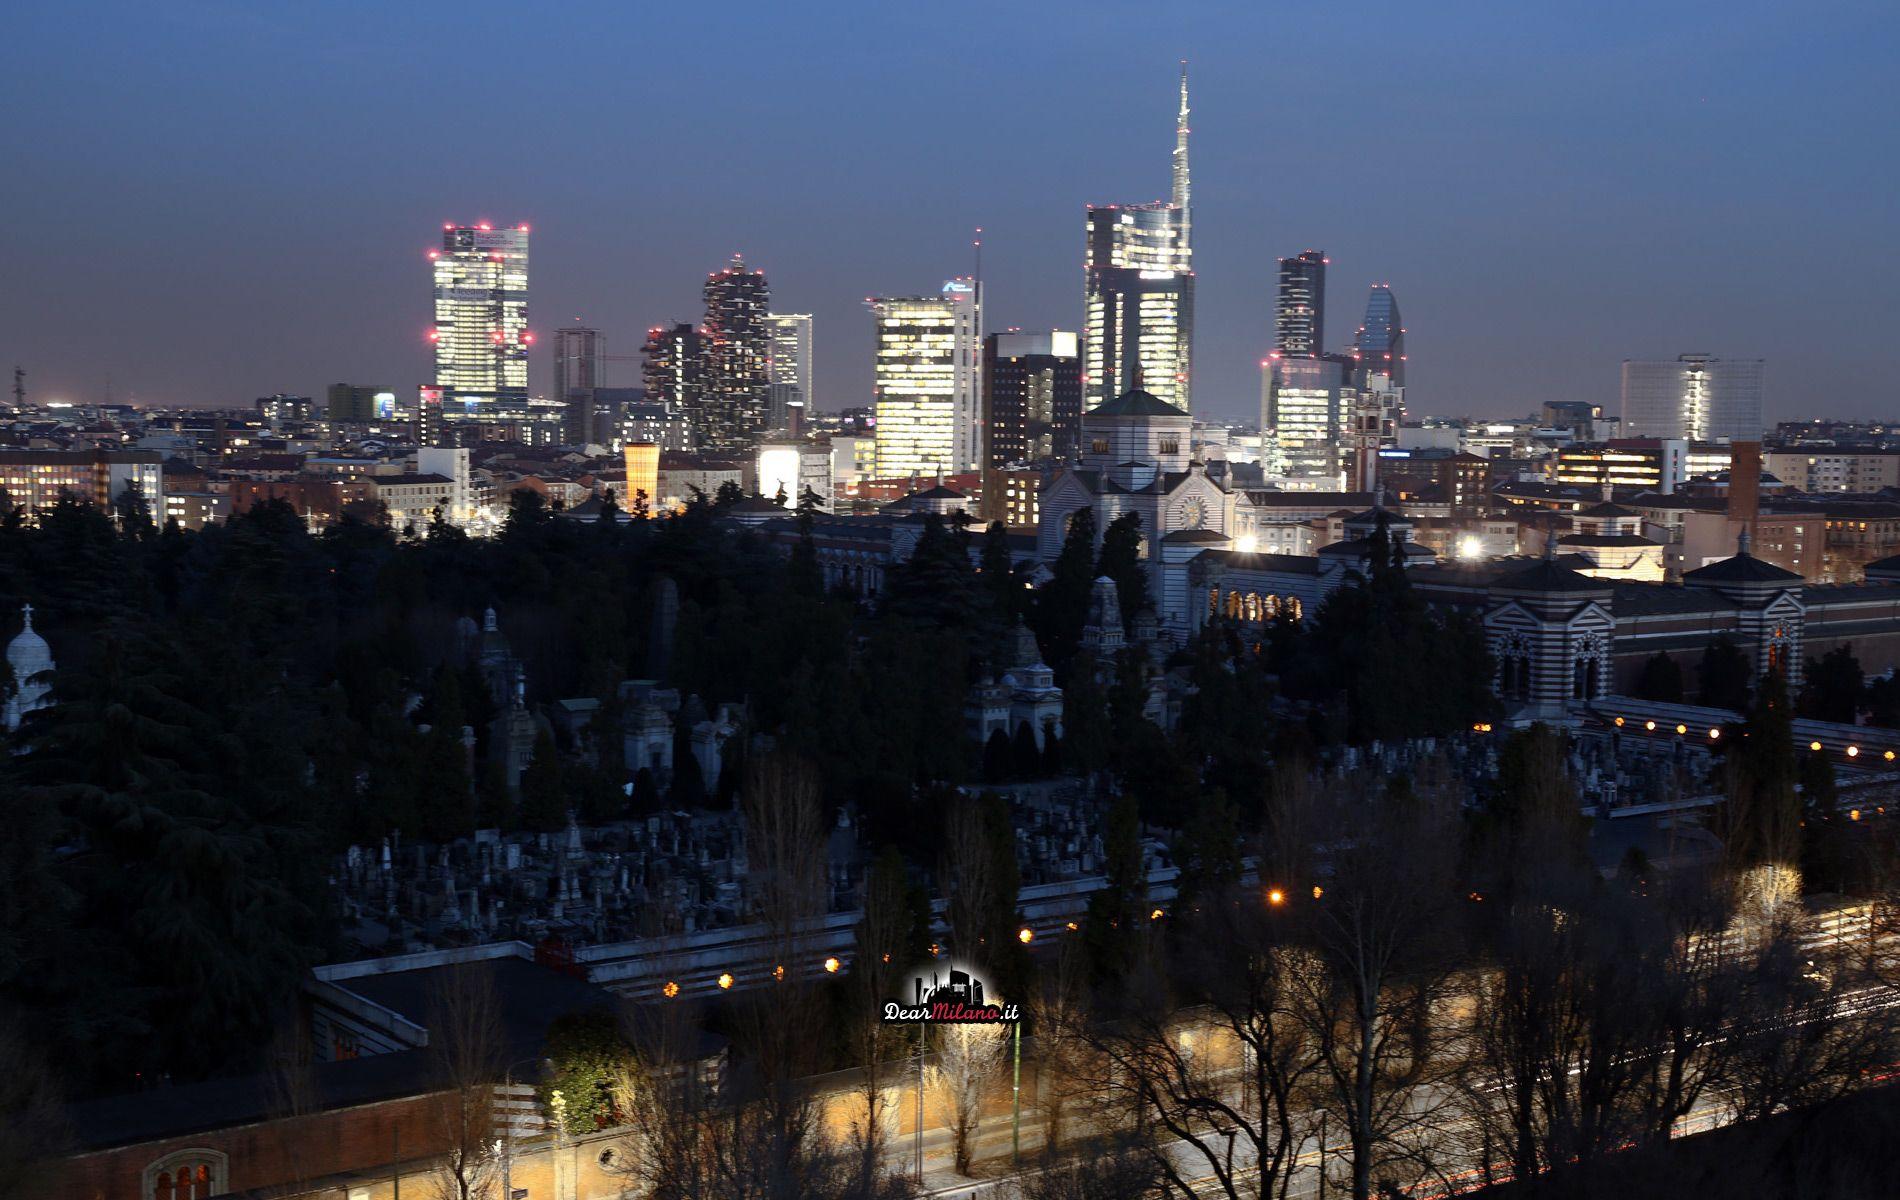 Grattacieli di Milano. Porta Nuova Skyline